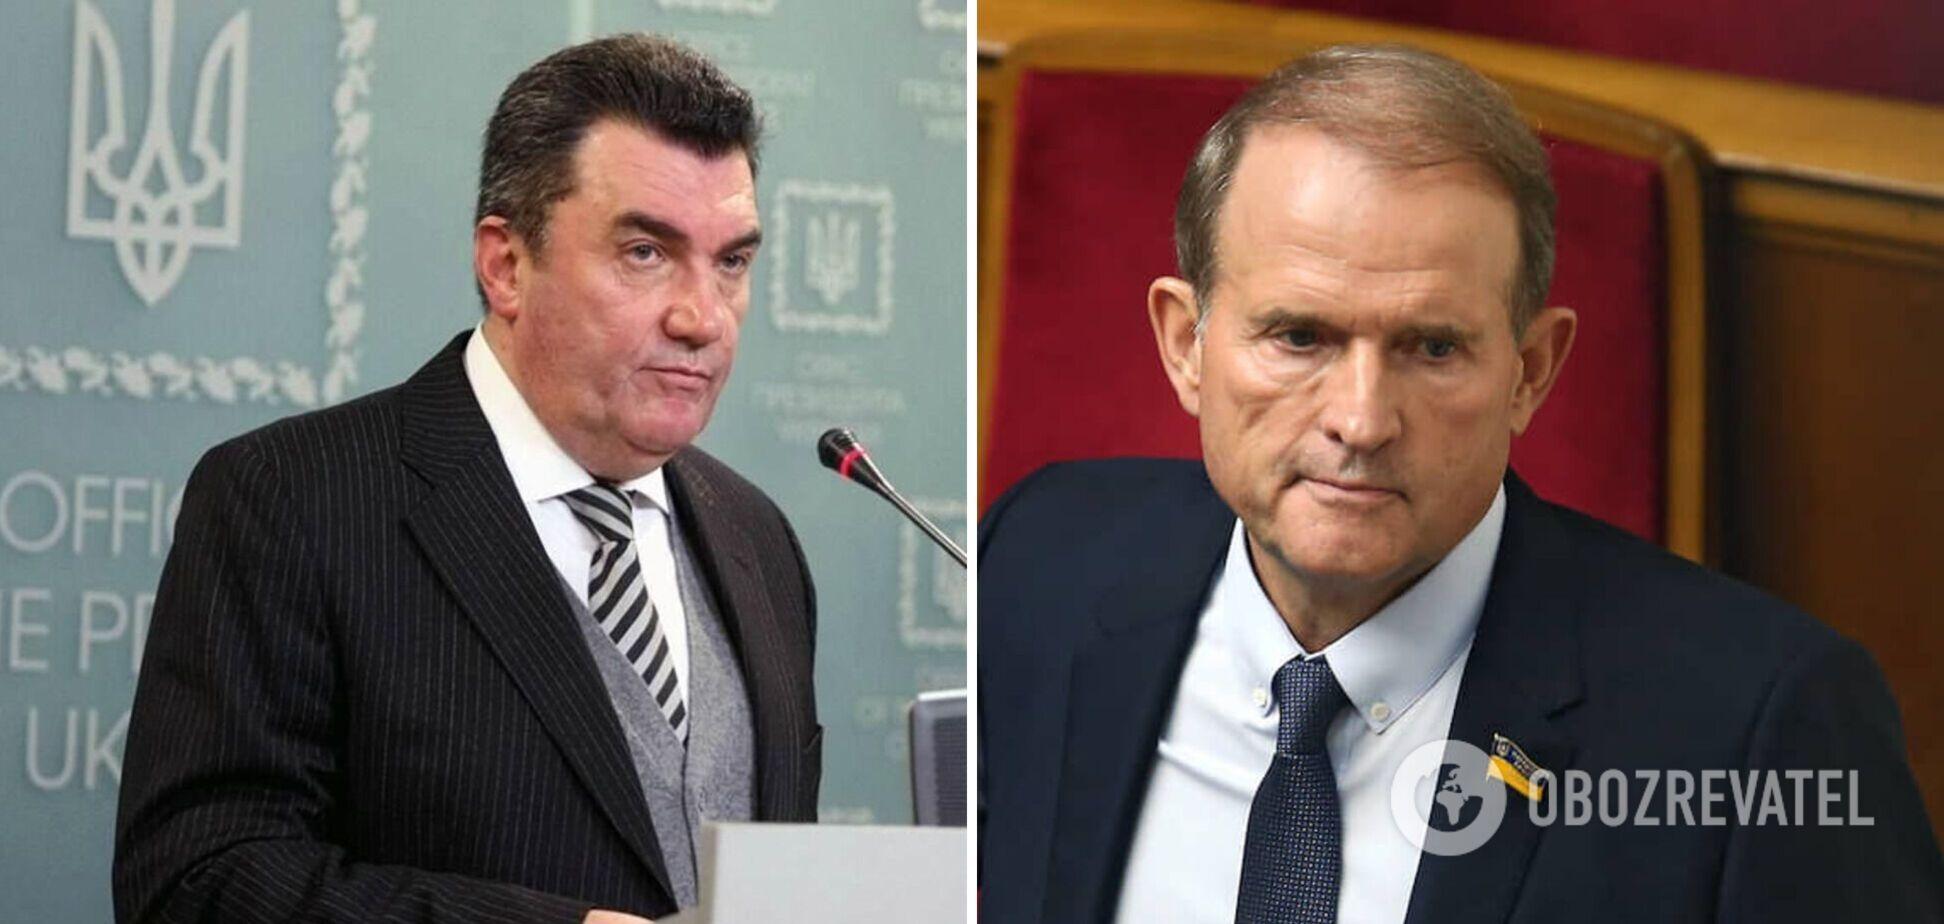 Данилов и Медведчук